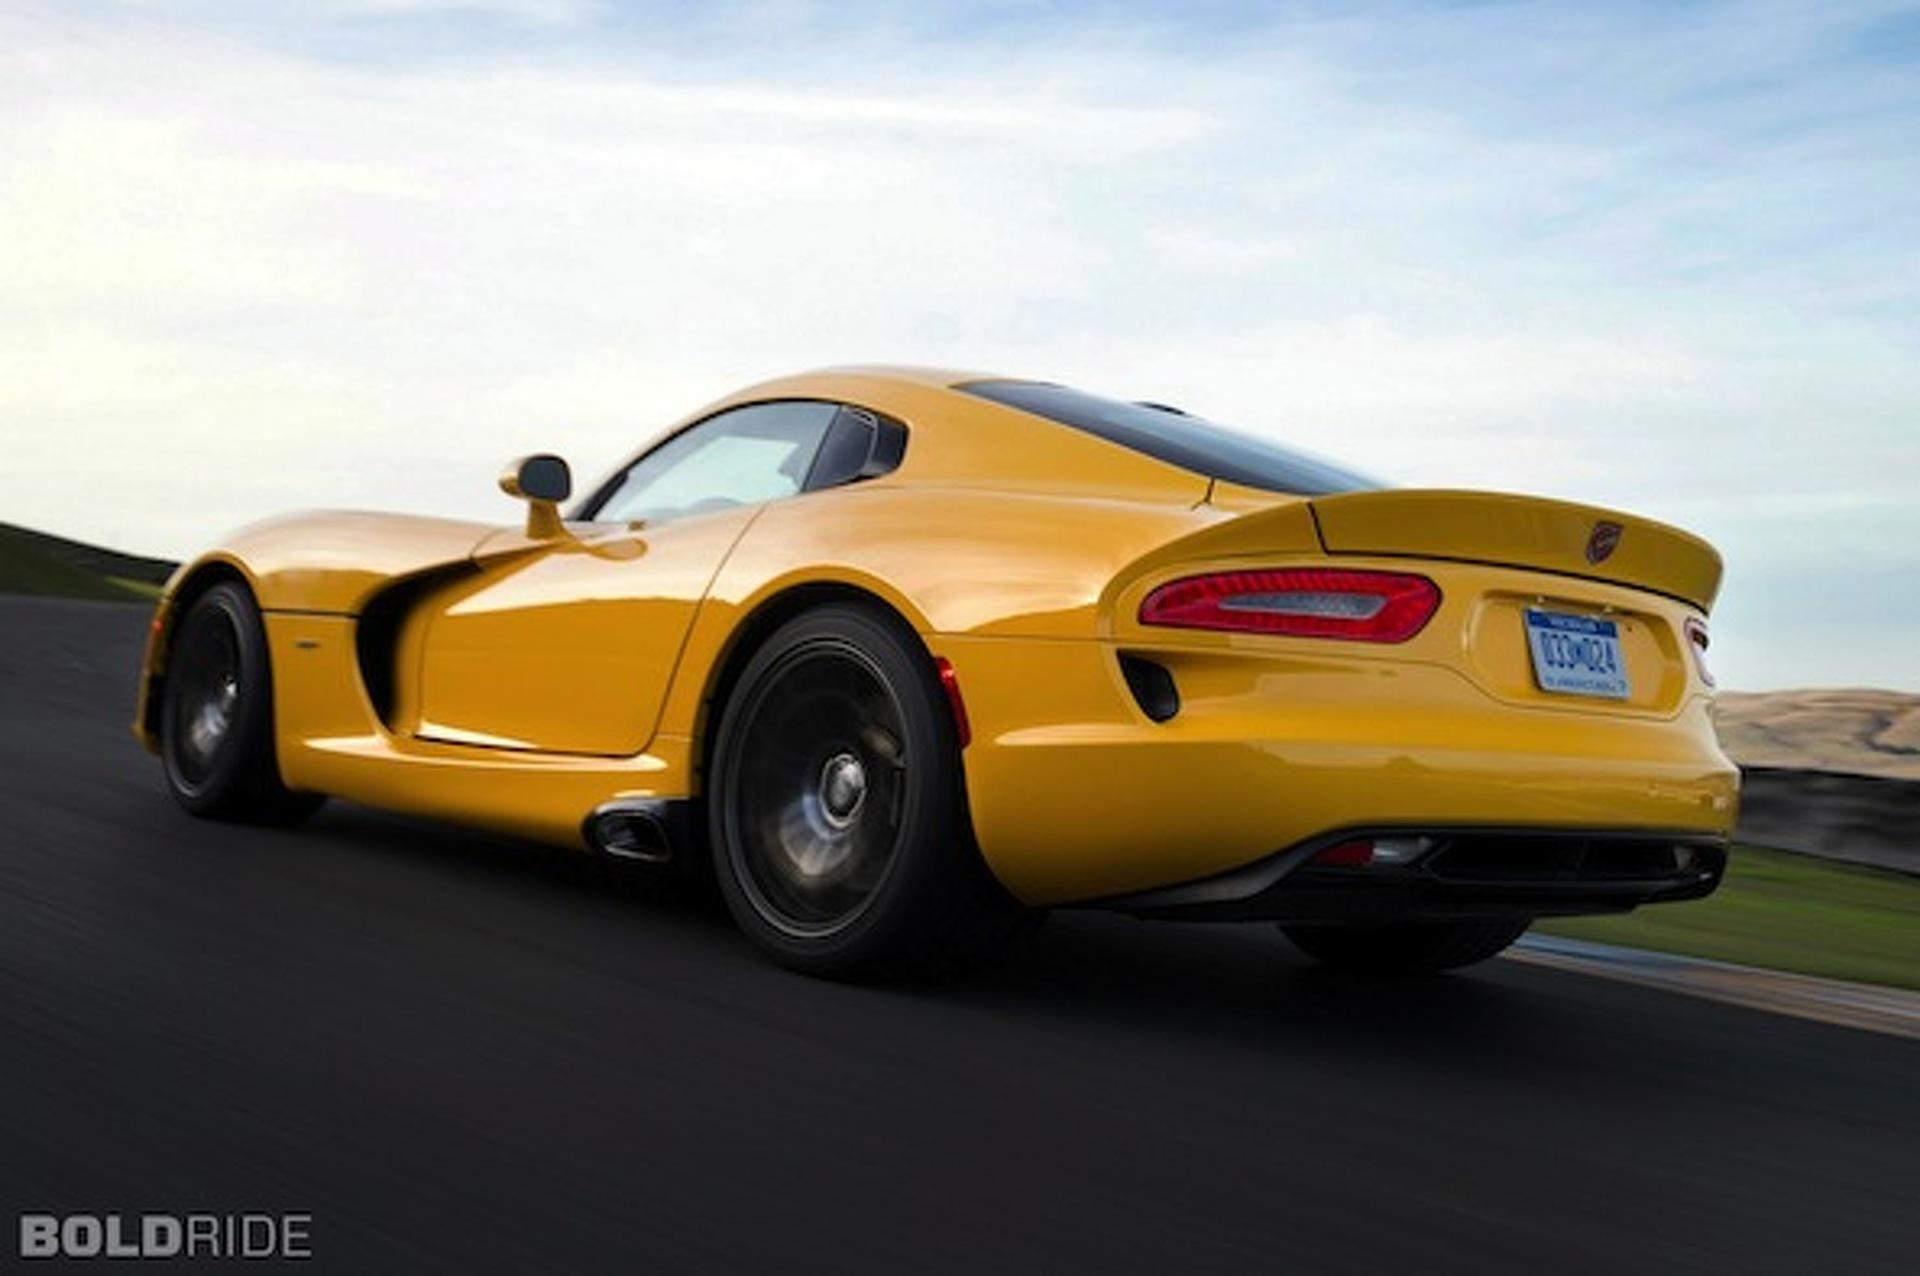 2014 SRT Viper Price Bumped to $99,395*